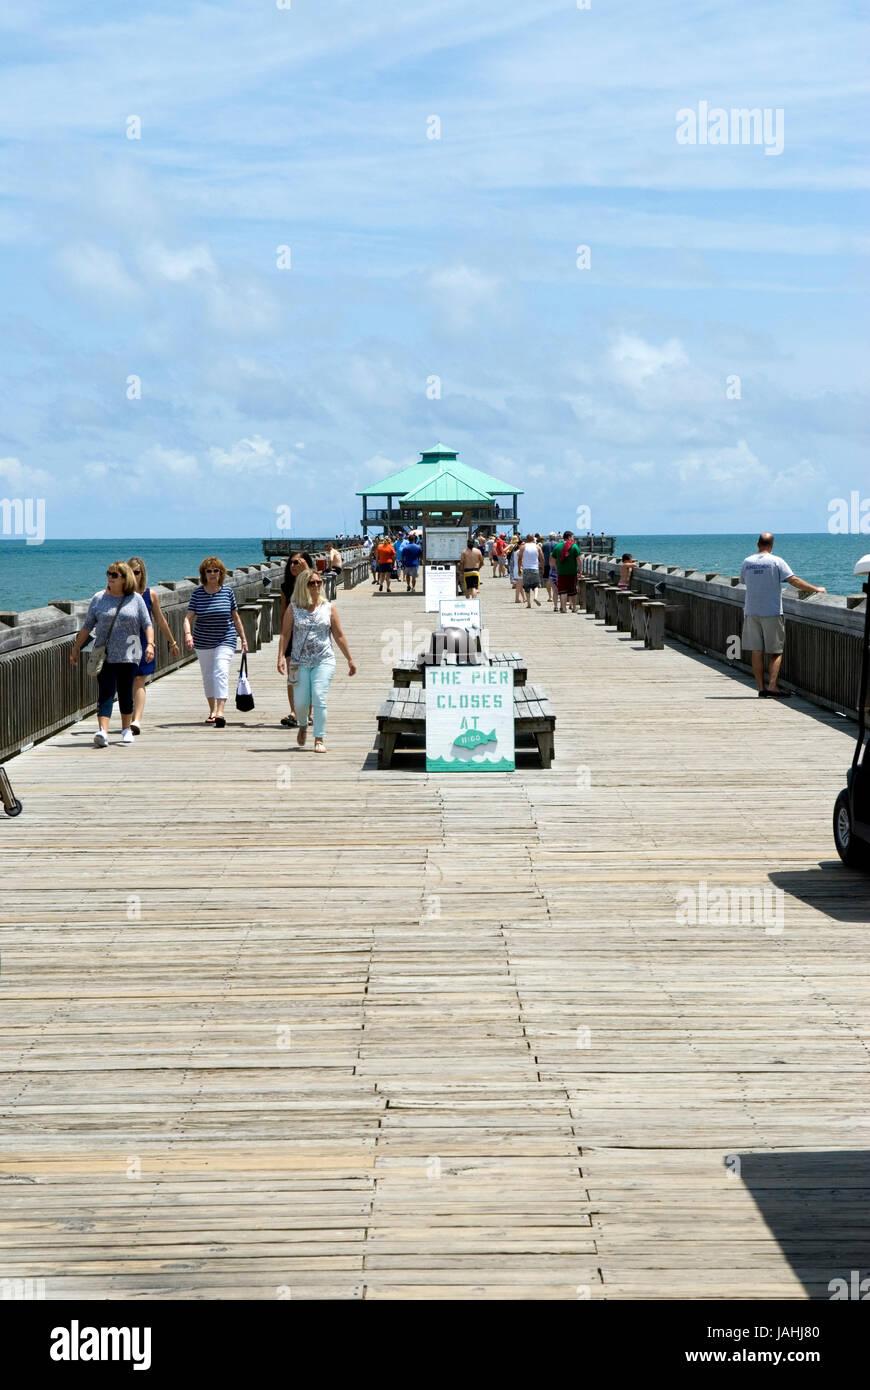 Stock photo of tourists walking along Folly Beach Fishing Pier in